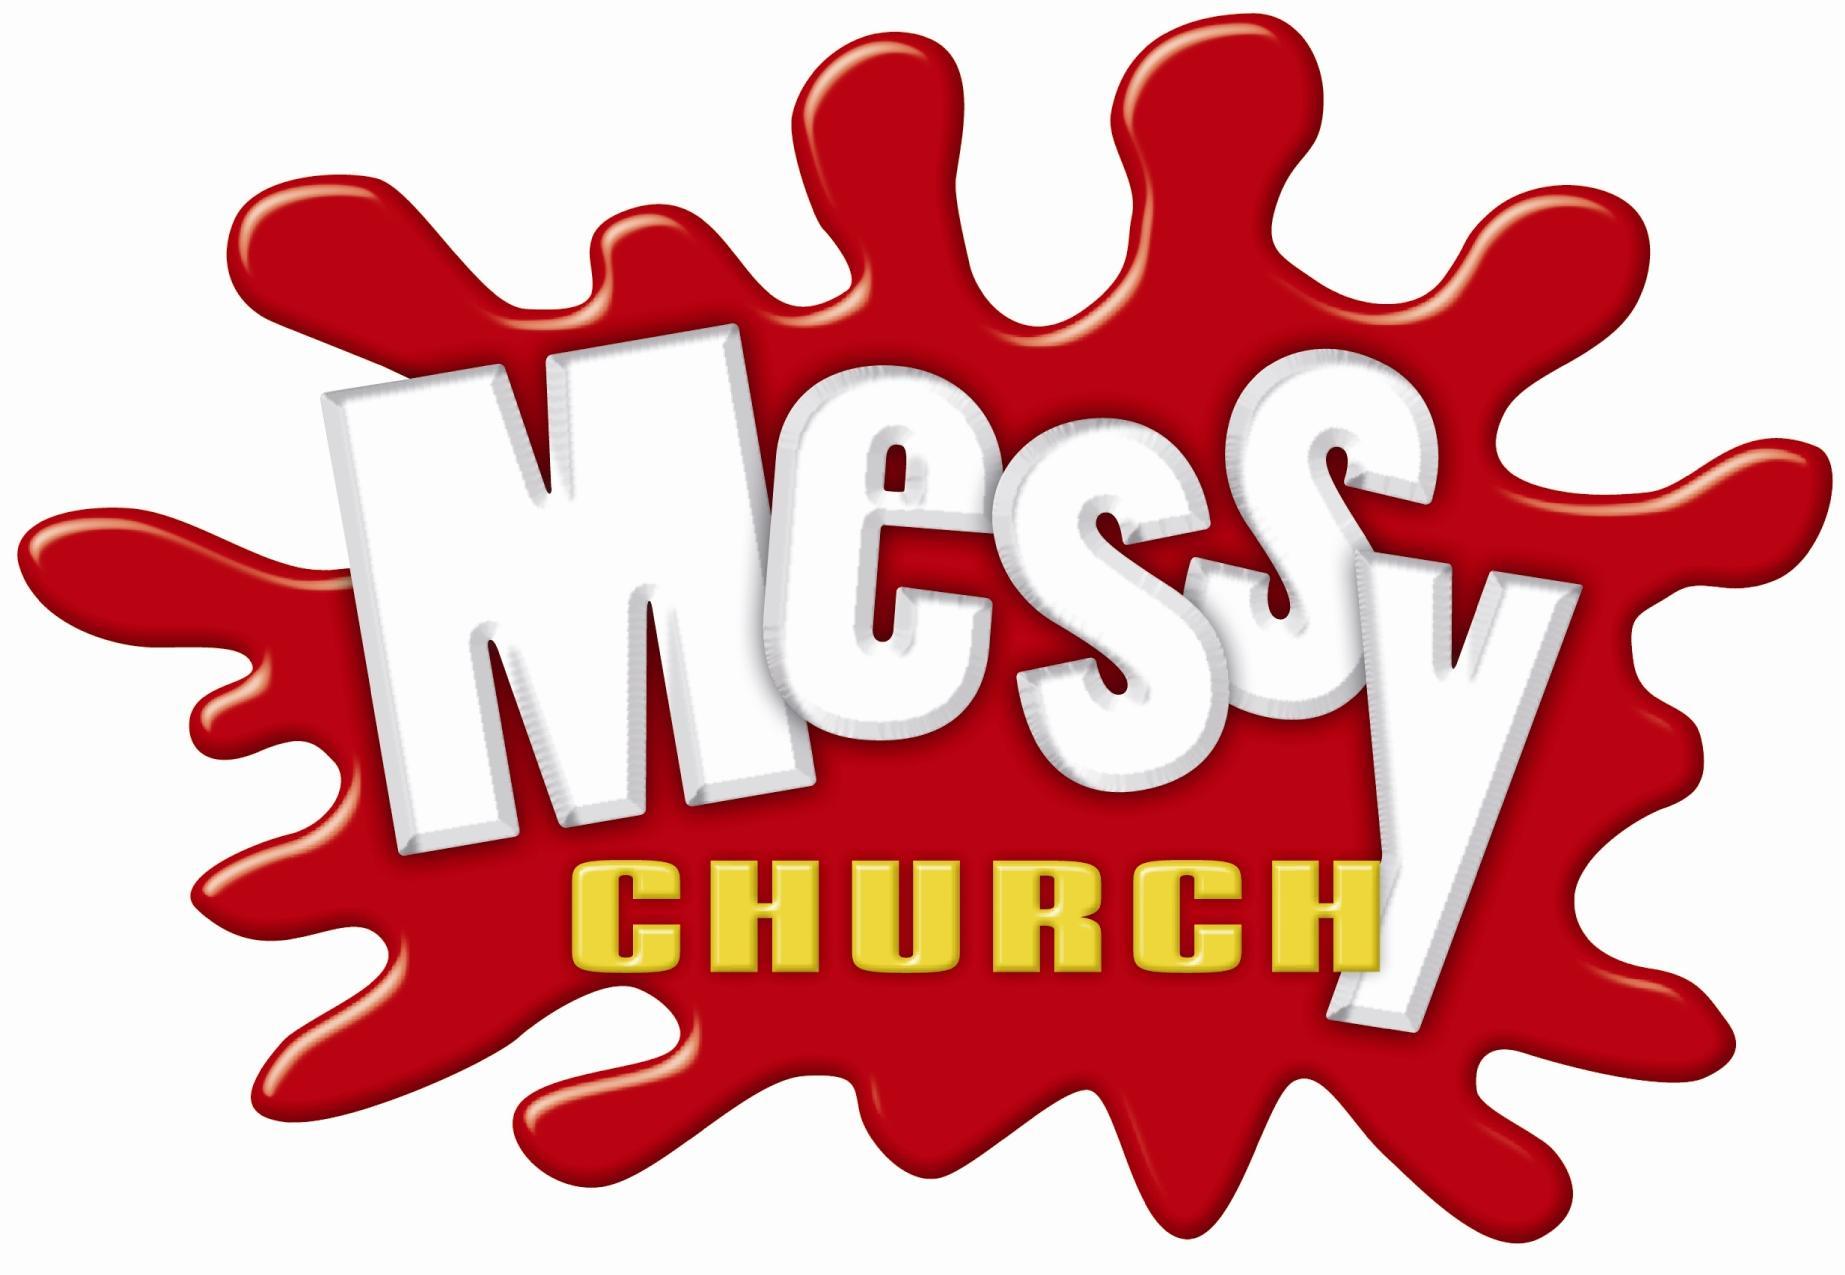 messy_church.jpg